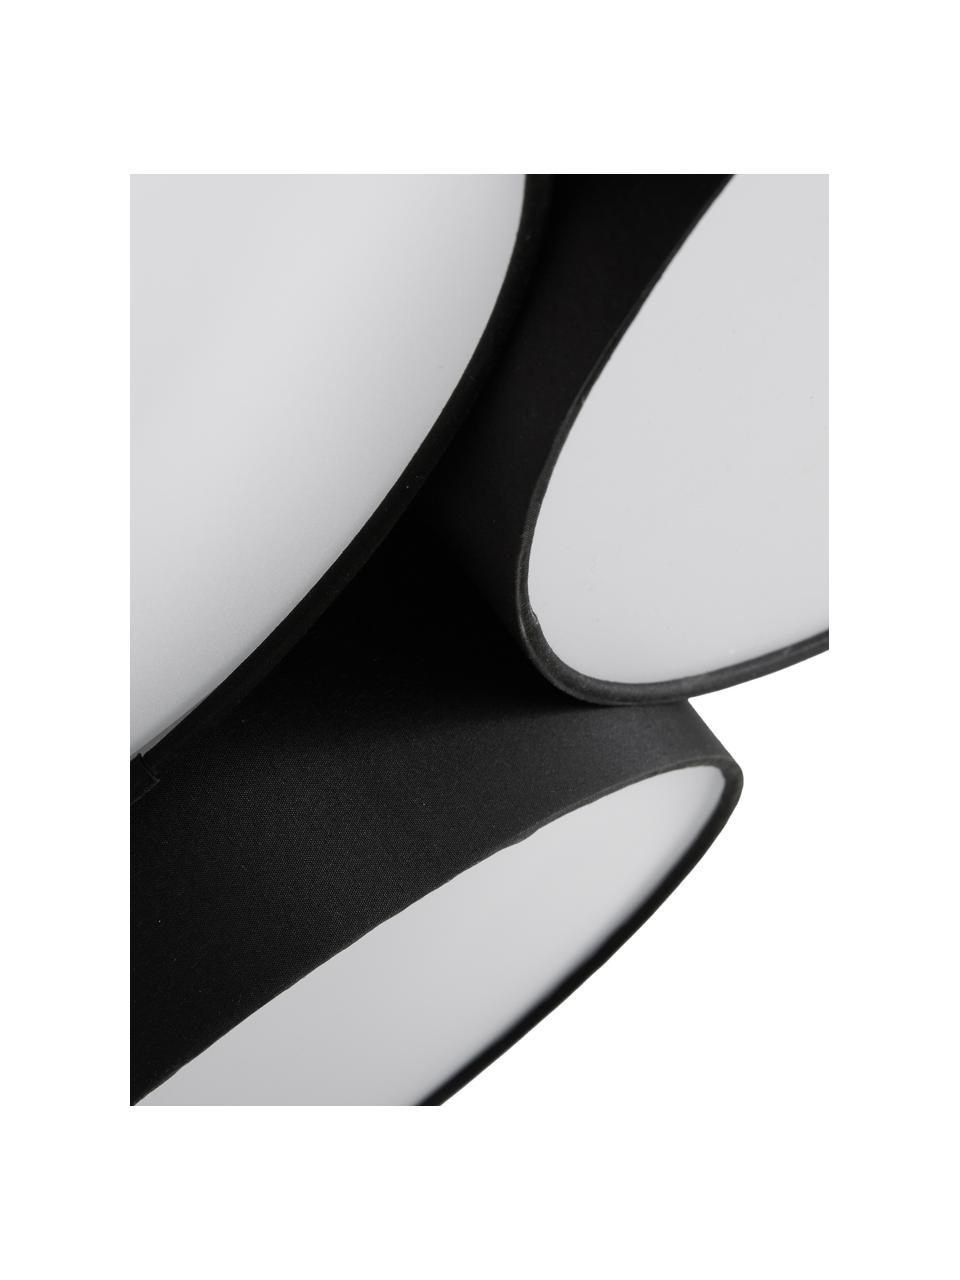 Plafoniera grande Luke, Baldacchino: metallo, verniciato a pol, Paralume: tessuto, Nero, Ø 61 x Alt. 26 cm